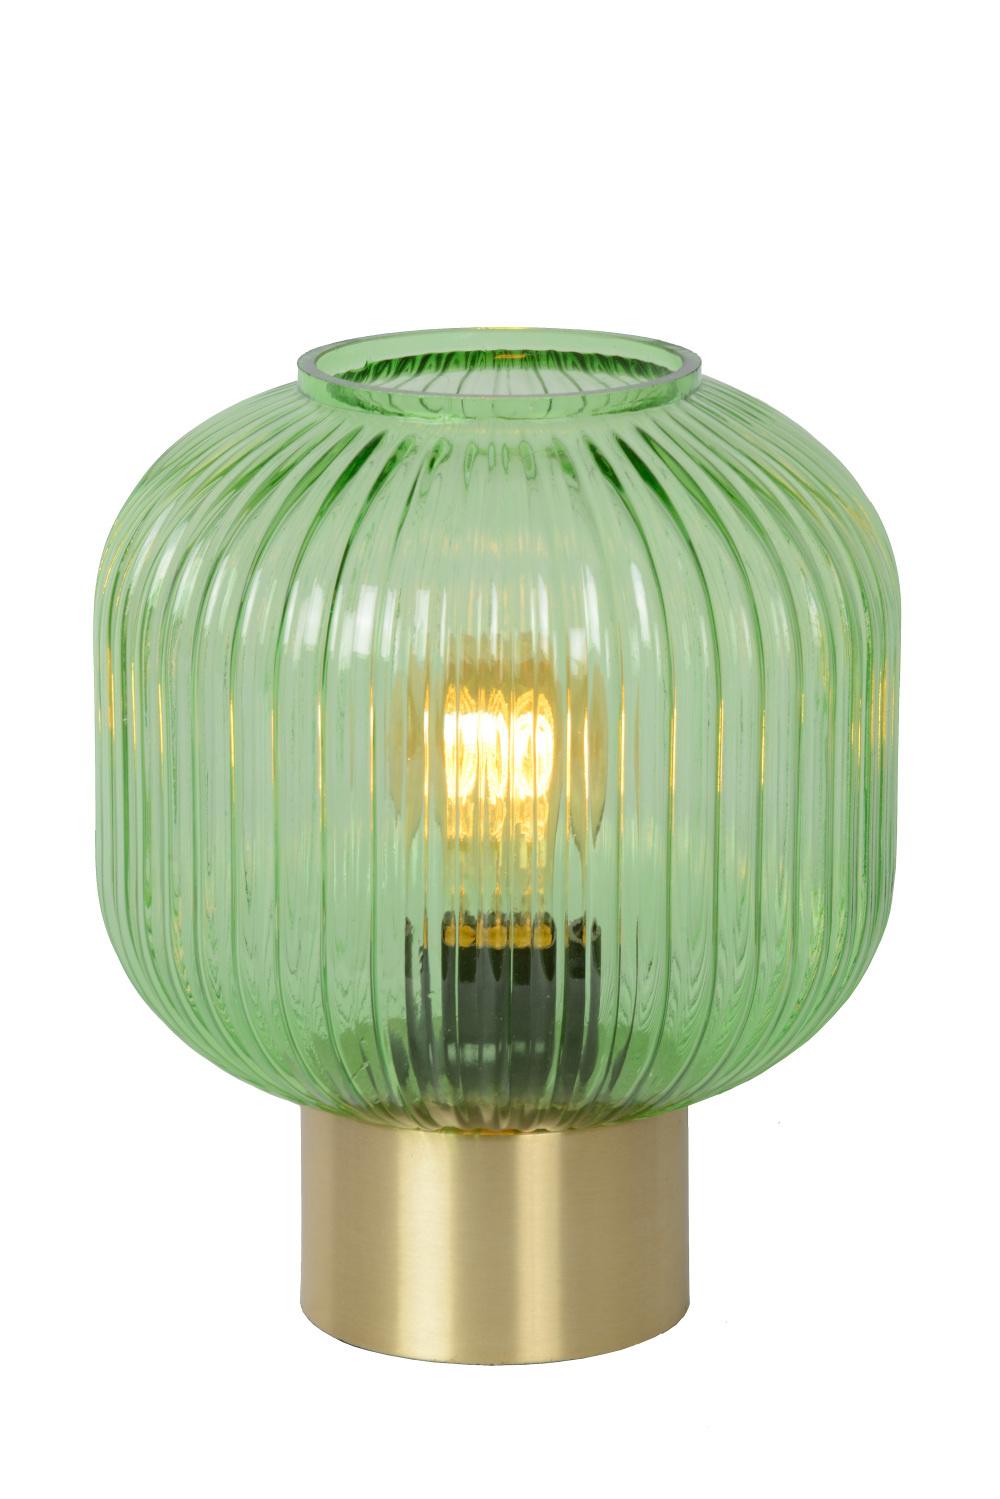 Lucide MALOTO Tafellamp-Groen-Ø20-1xE27-40W-Glas